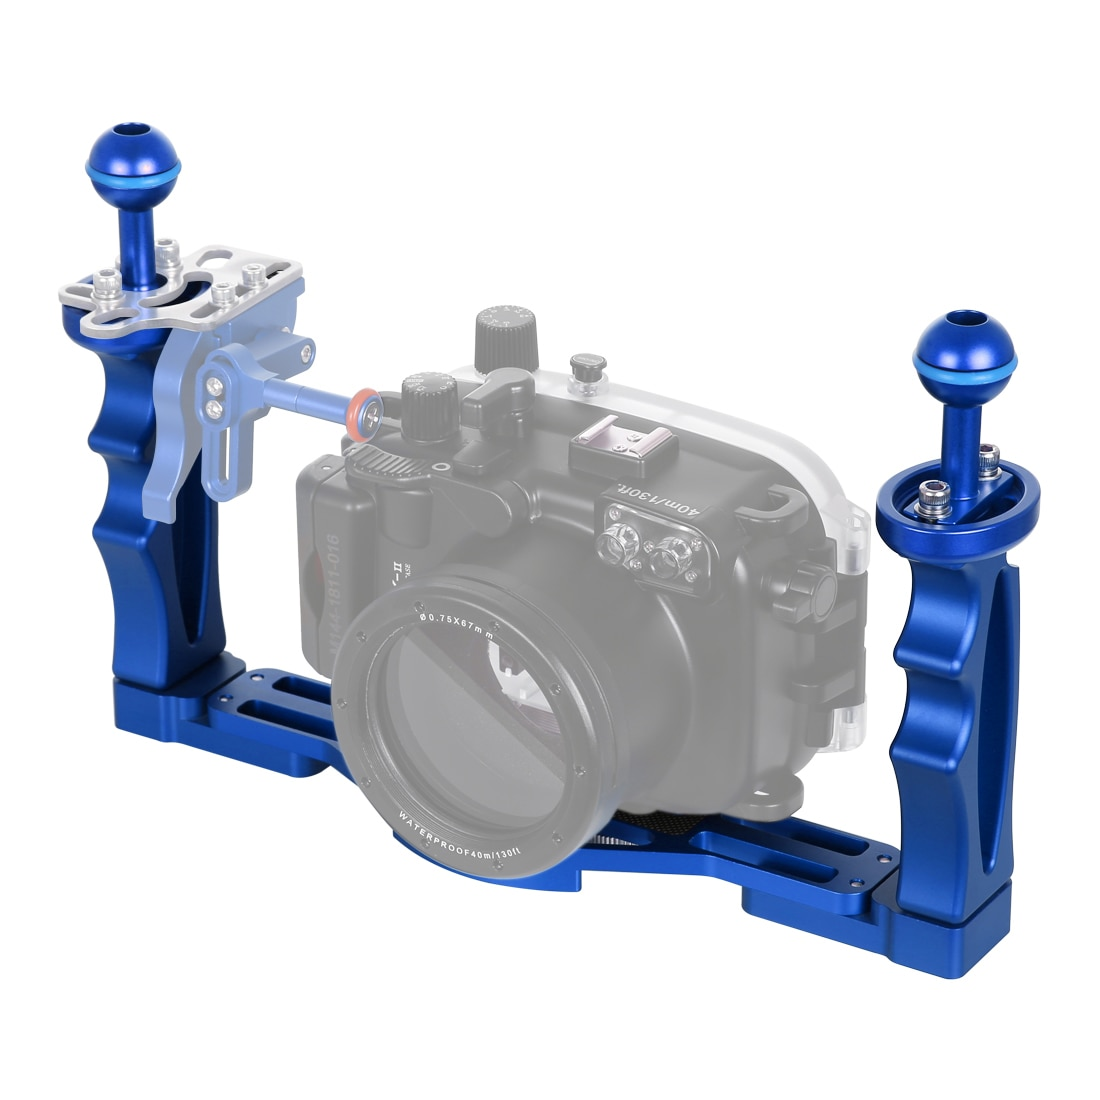 PULUZ Dual Handles Aluminium Alloy Tray Stabilizer for Gopro Action Camera Mobile Phone Underwater DSLR Digital Camera Housings